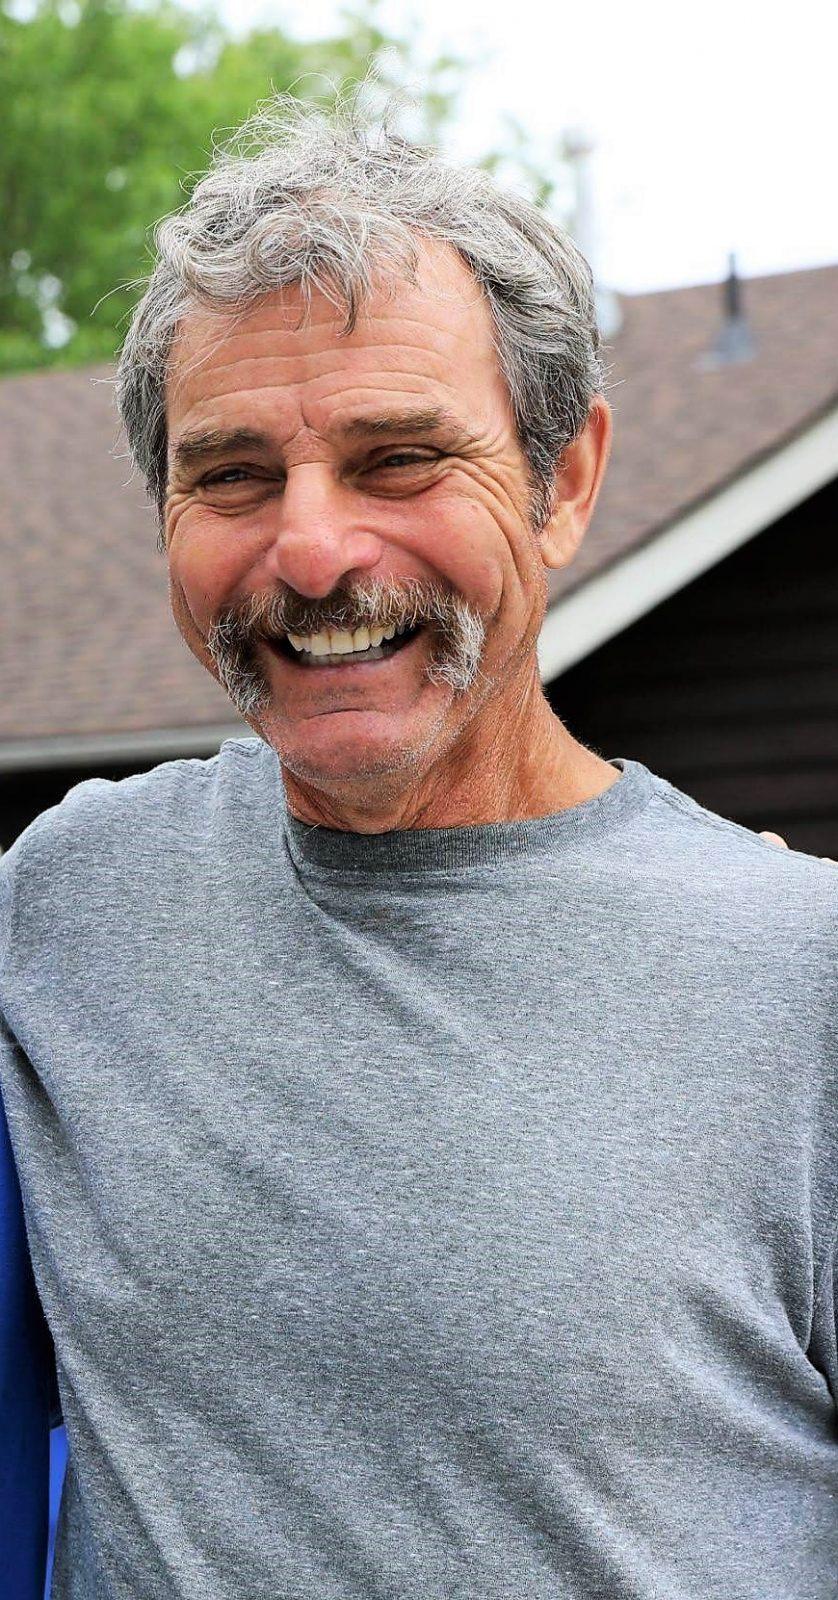 Vince Robichaud